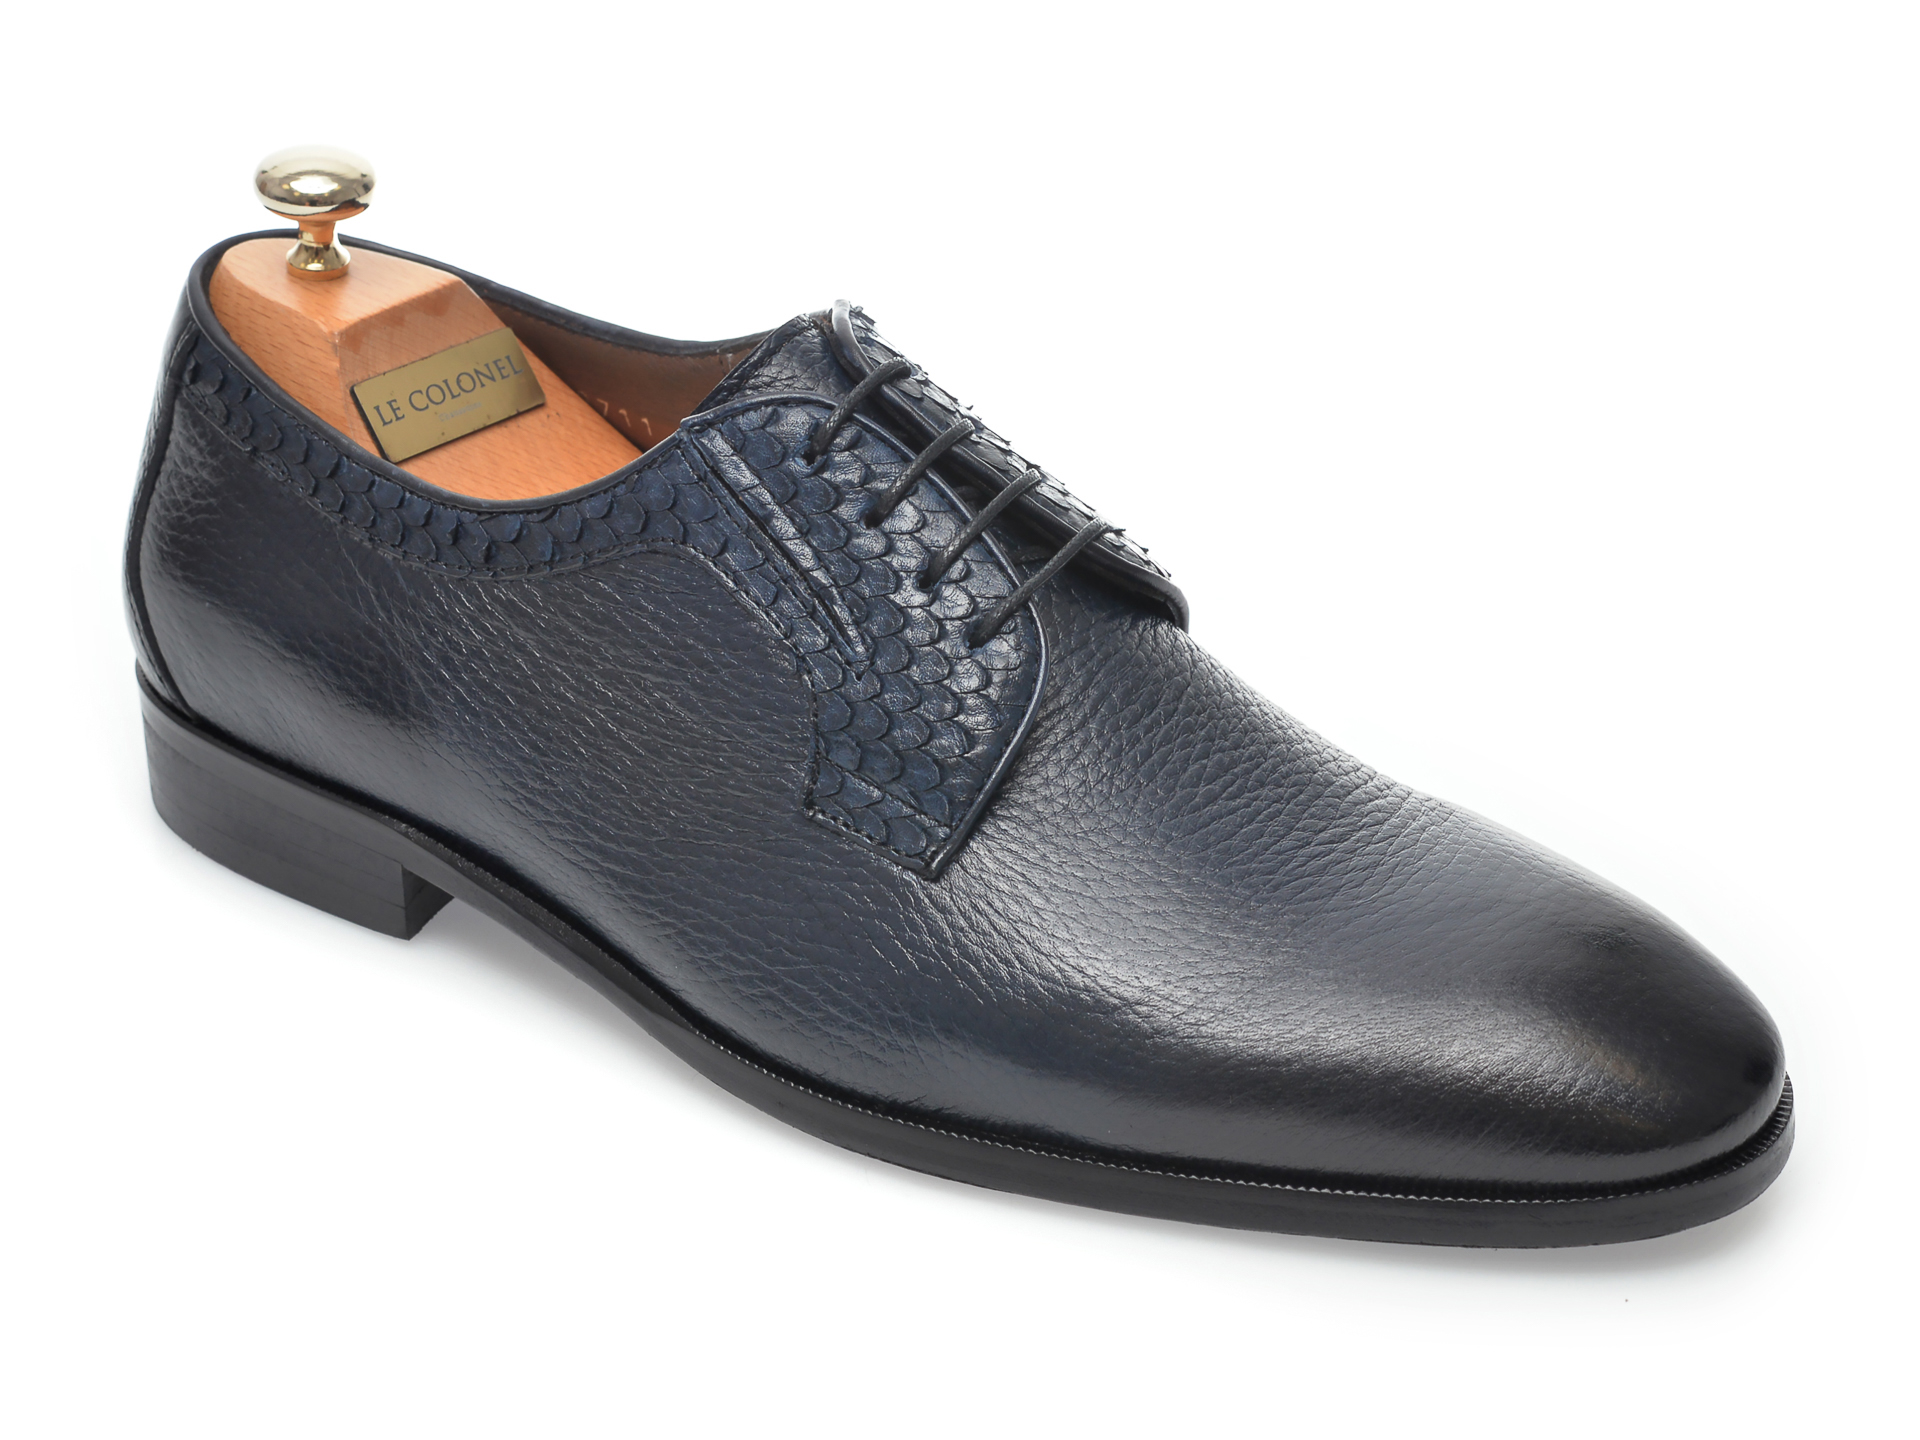 Pantofi LE COLONEL bleumarin, 48711, din piele naturala imagine otter.ro 2021